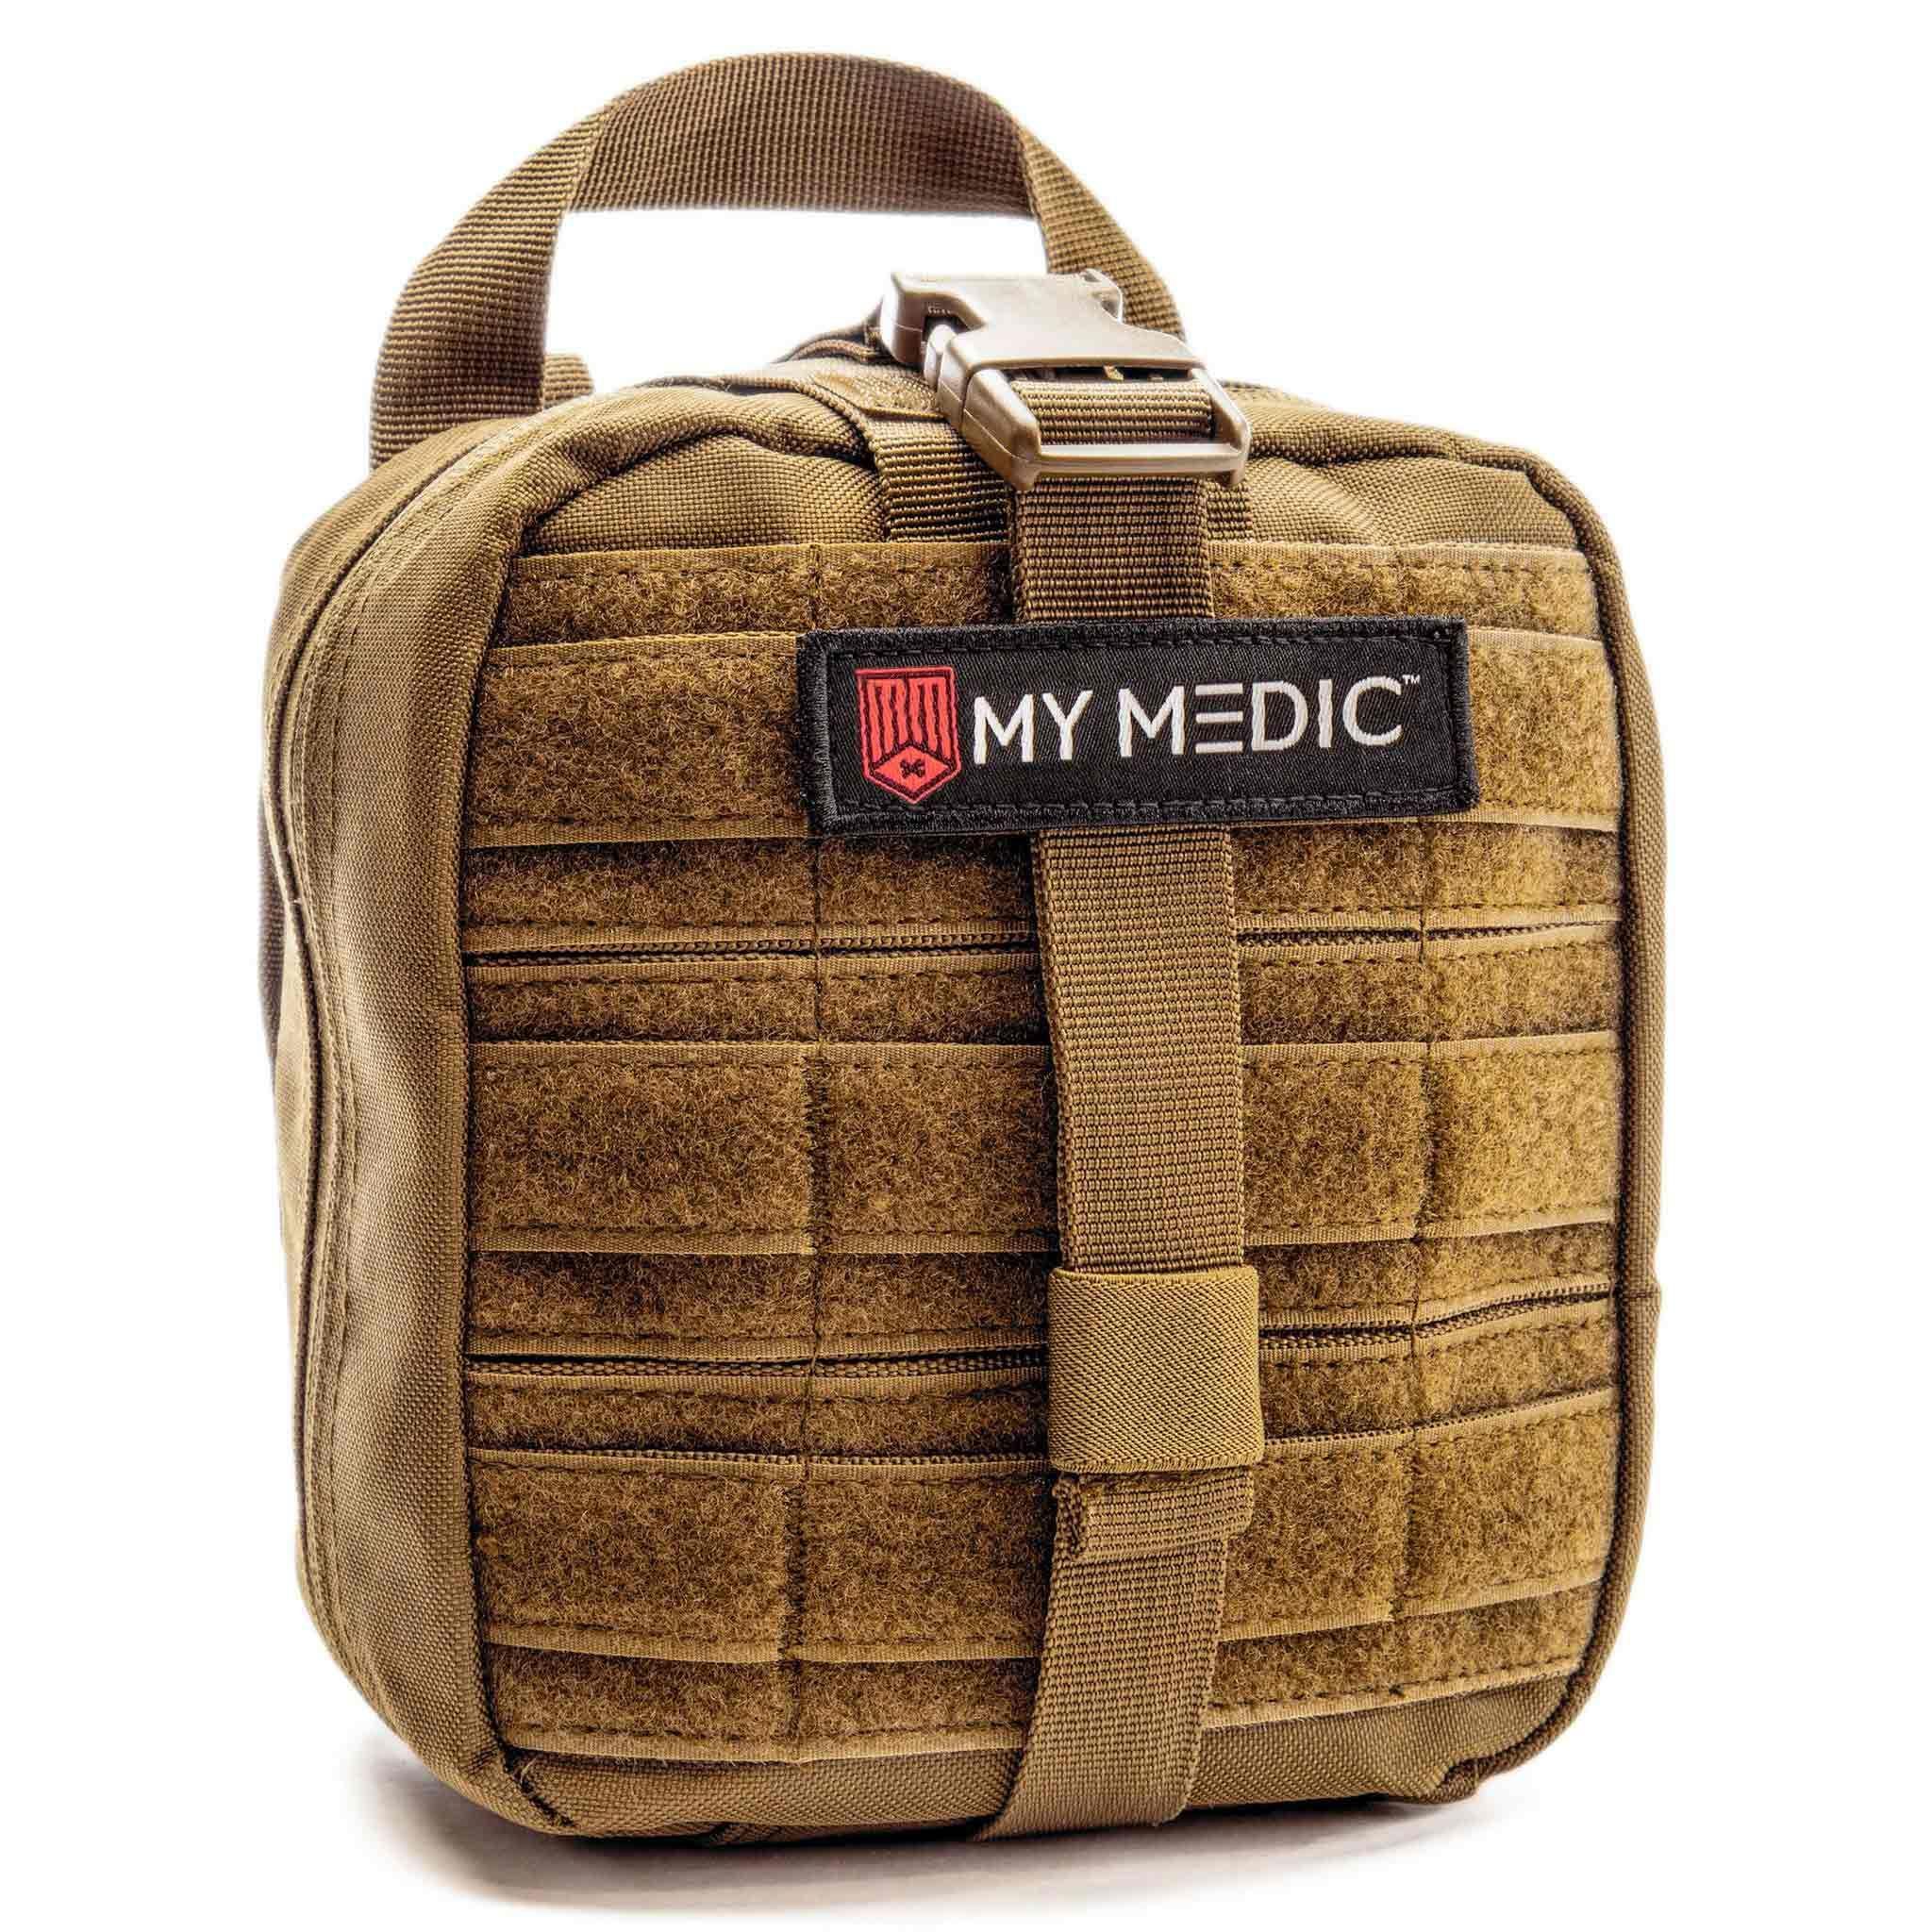 Myfak First Aid Kit In 2021 First Aid Kit Mini First Aid Kit Best First Aid Kit